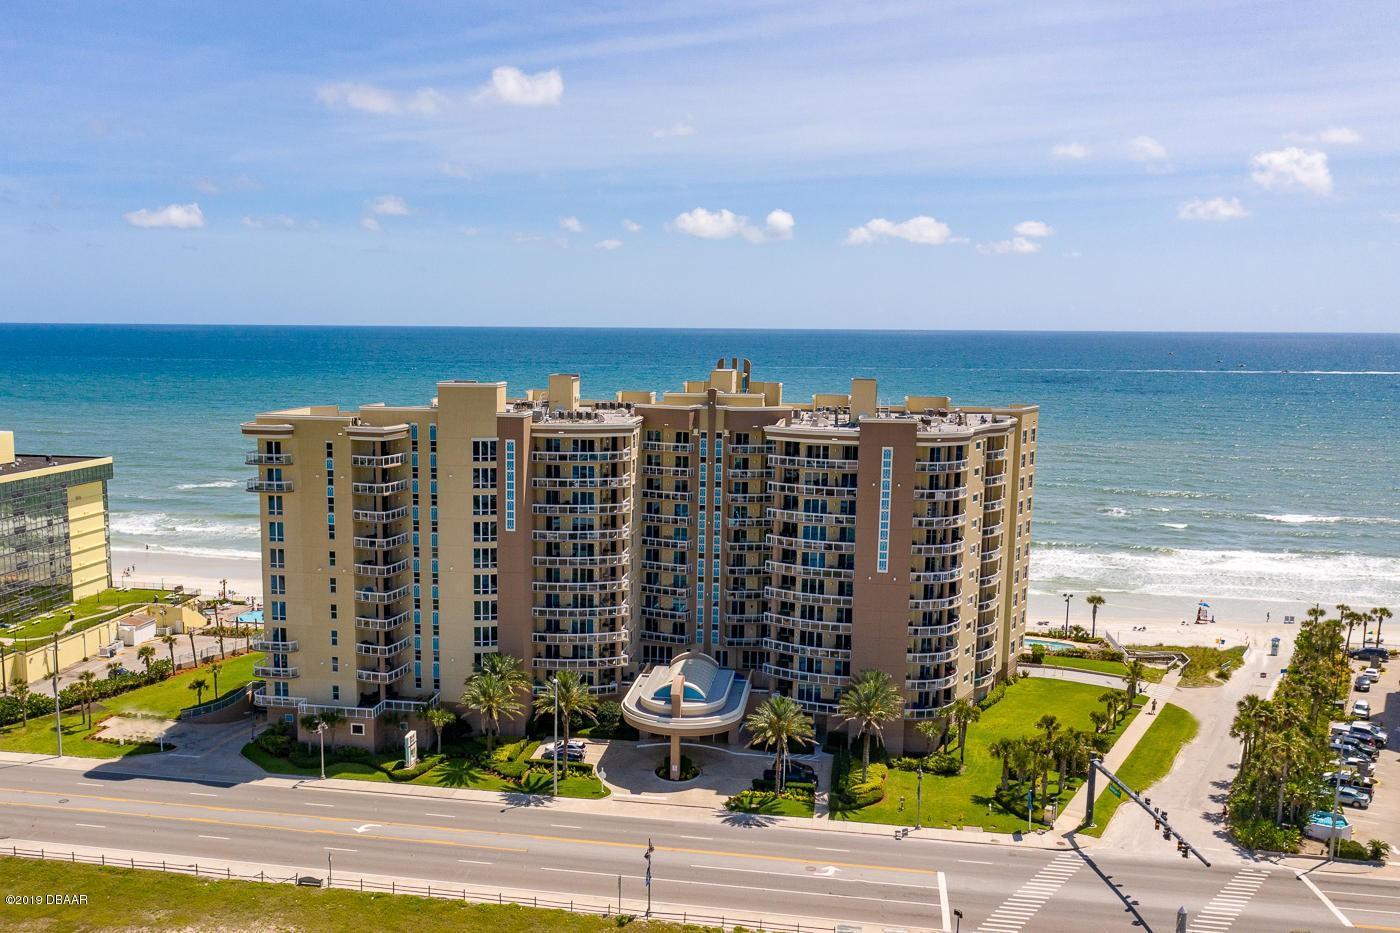 1925 S Atlantic Avenue 32118 - One of Daytona Beach Shores Homes for Sale